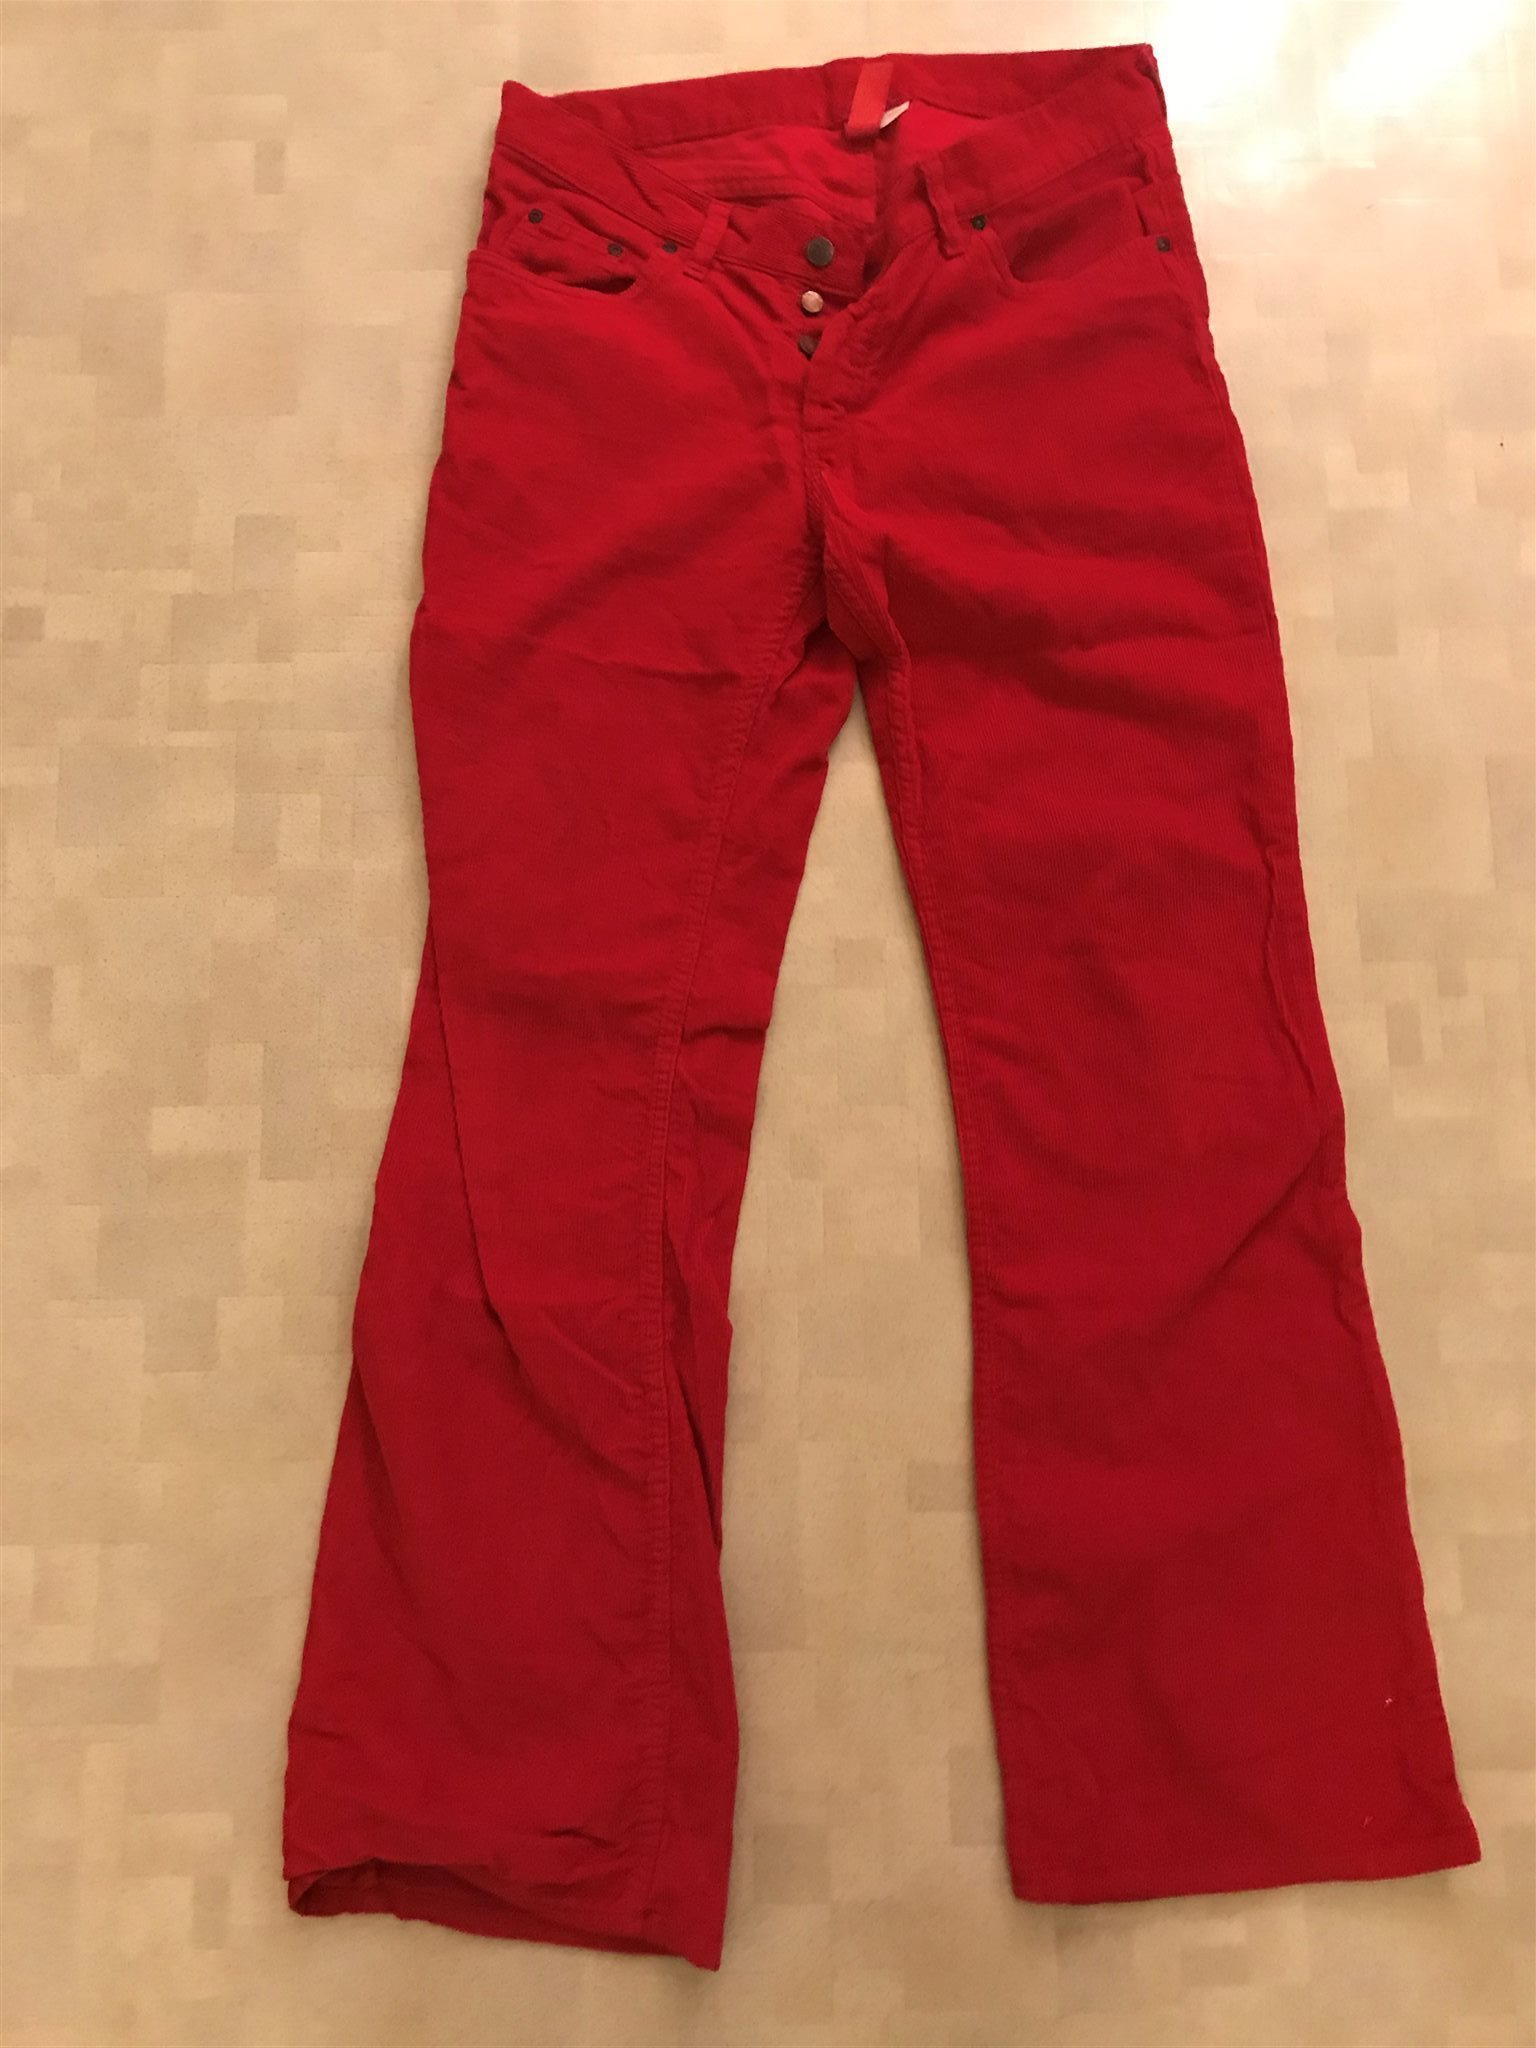 Röda manchesterbyxor DIVIDED H M storlek 32 32 .. (337097235) ᐈ Köp ... 86aa7da187b11